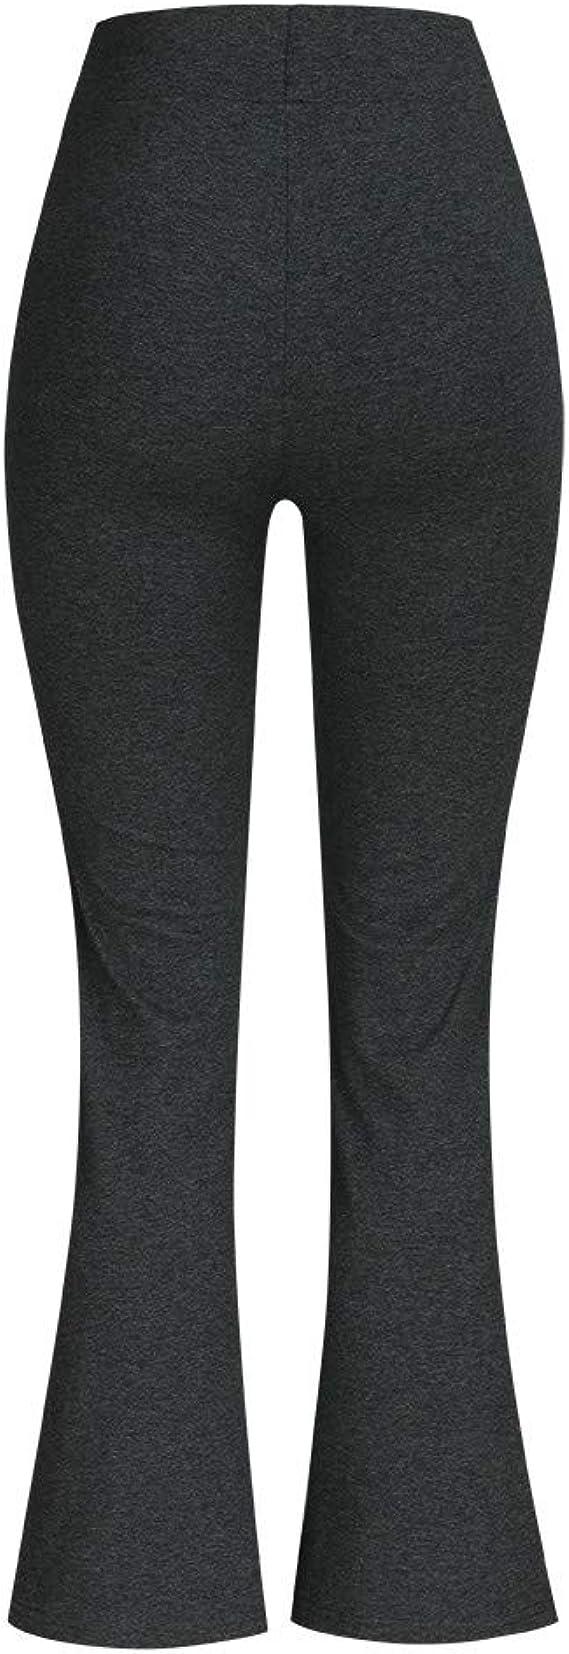 Trisee Pantalones Acampanados para Mujer, Pantalón Deportivo Negro ...